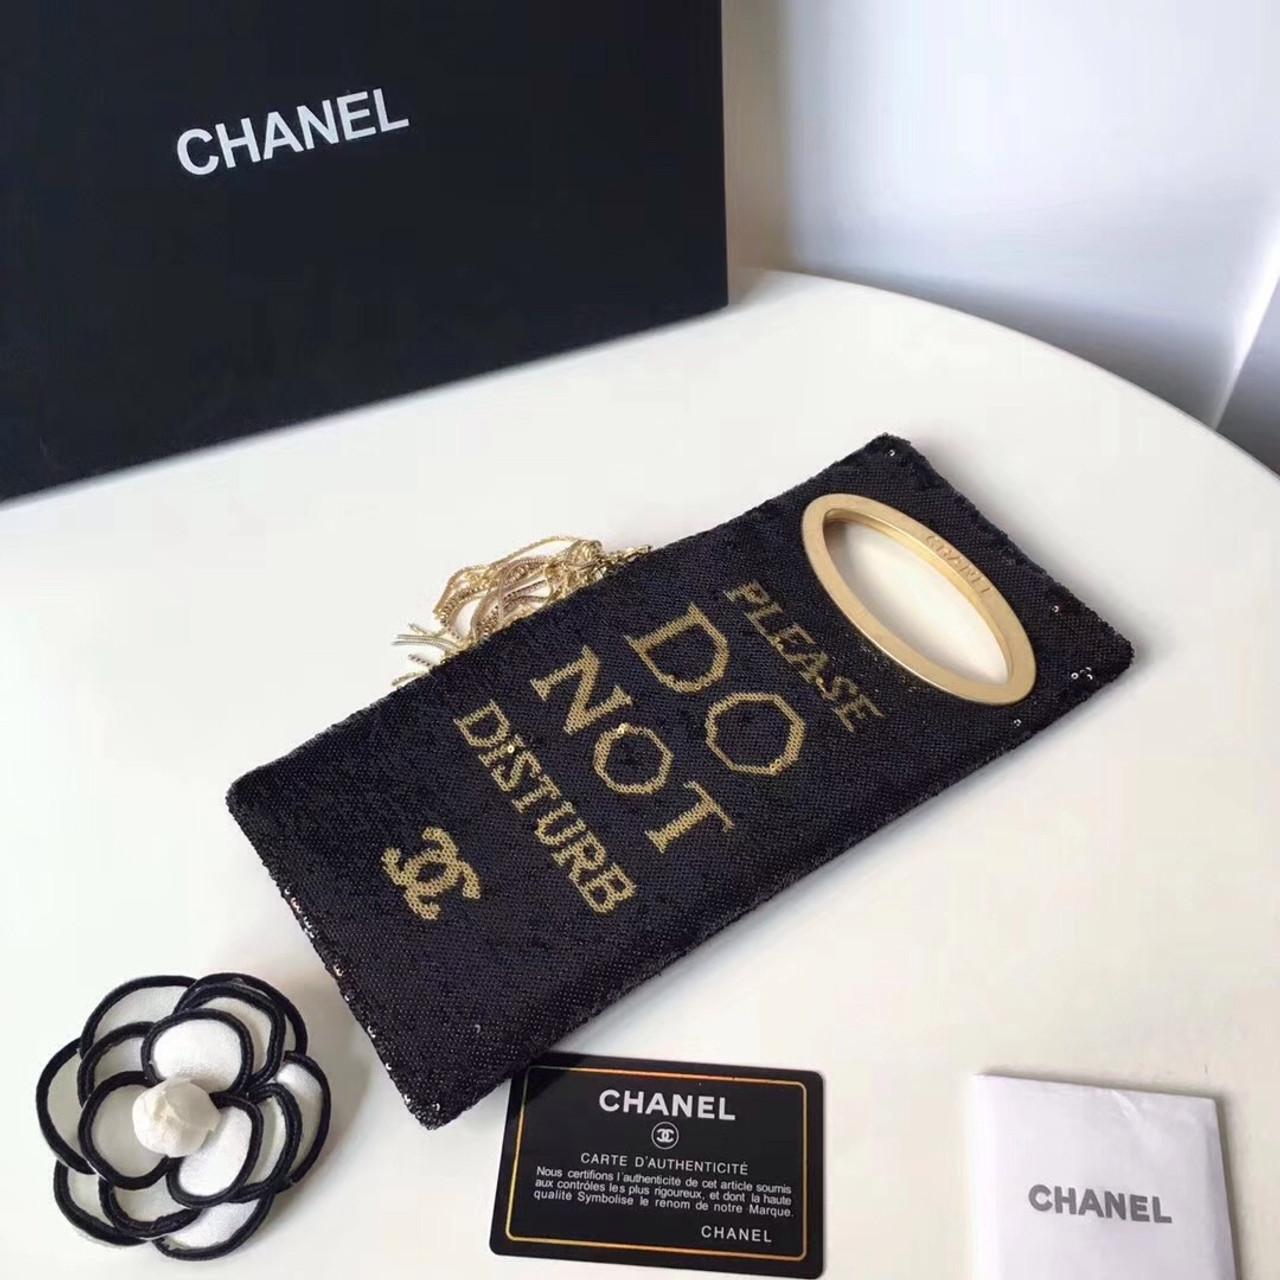 c17bd12de27a Chanel Please Do Not Disturb Clutch Bag - Bella Vita Moda